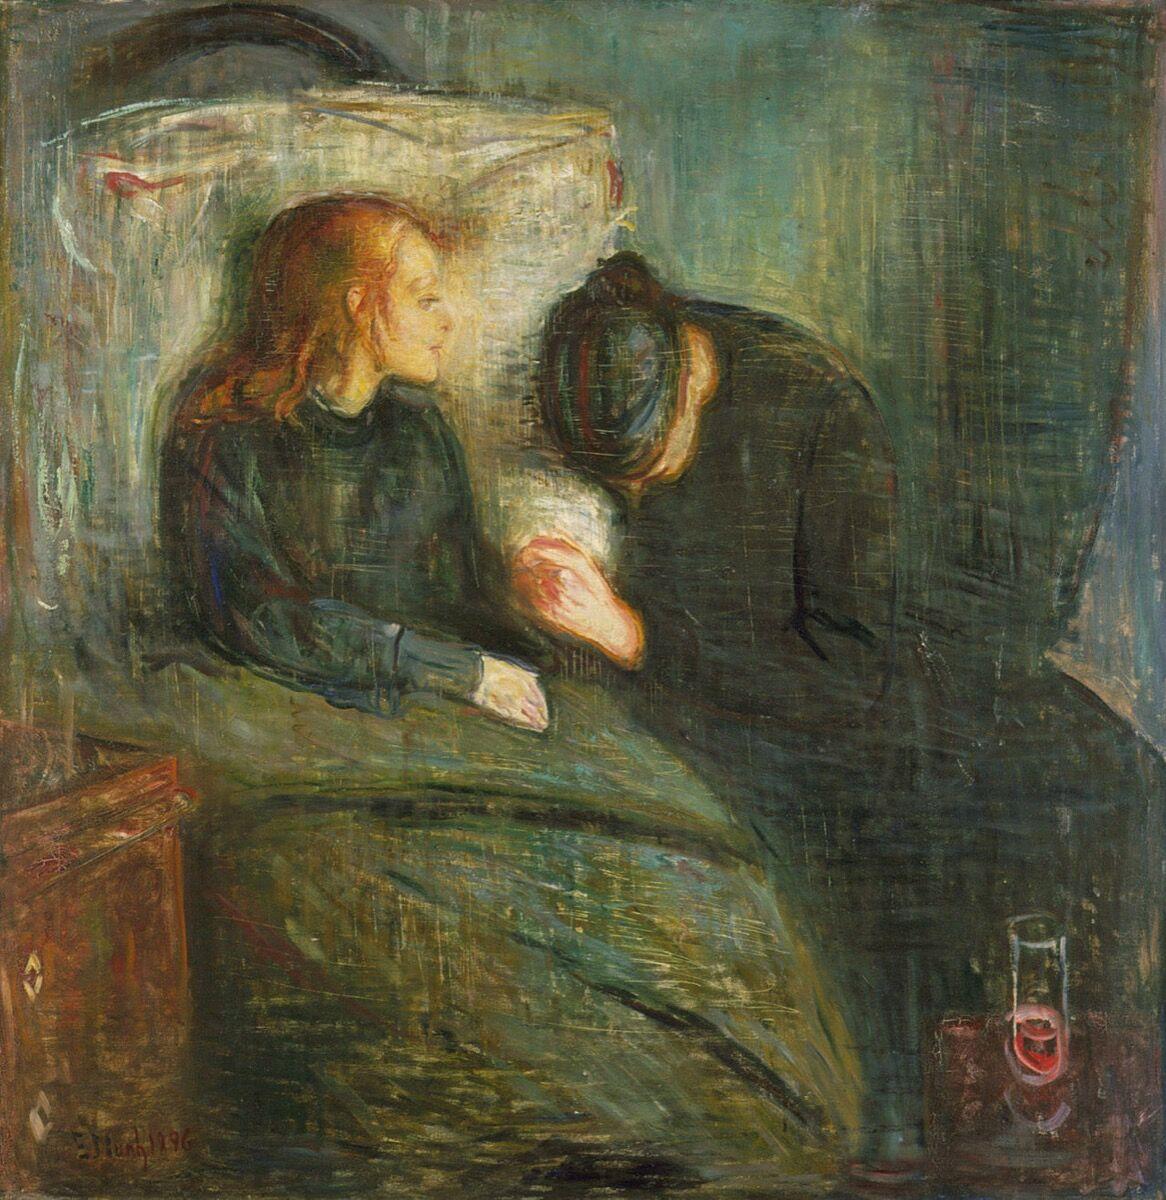 Edvard Munch, The Sick Child, 1896. Via Wikimedia Commons.